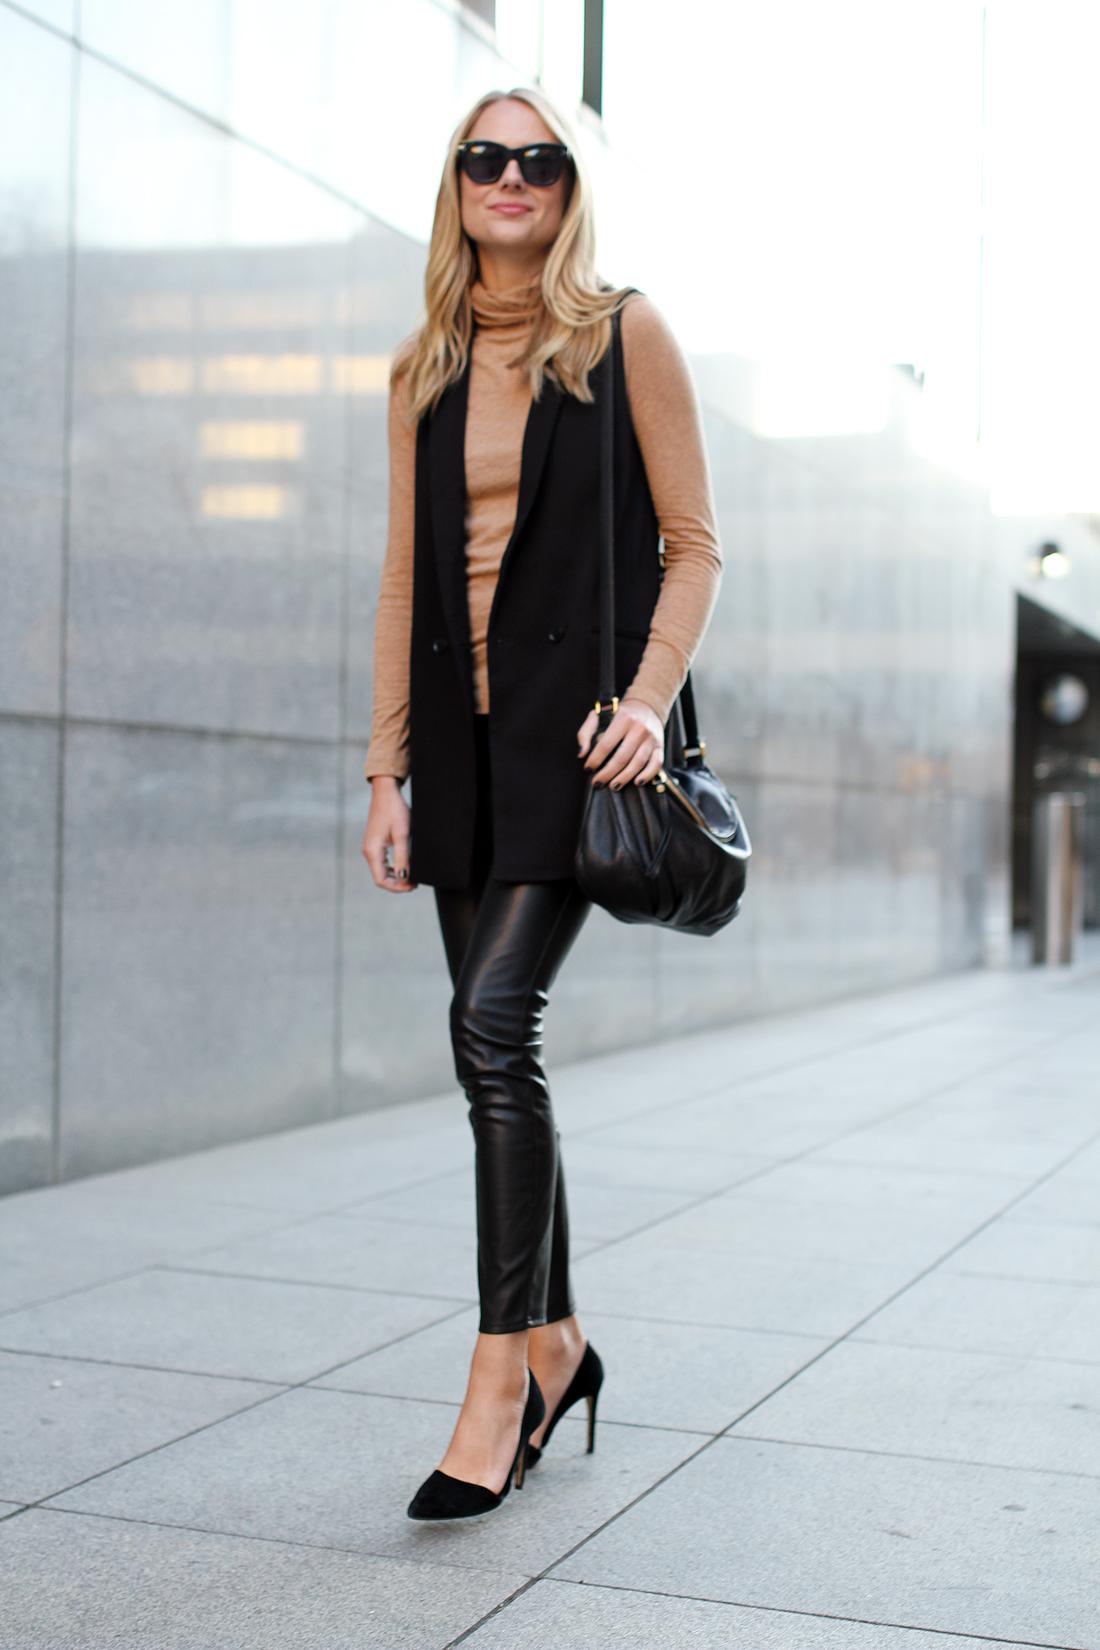 fashion-jackson-madewell-camel-turtleneck-black-long-vest-black-faux-leather-skinny-pants-black-suede-pumps-marc-by-marc-jacbos-natasha-q-handbag-celine-sunglasses